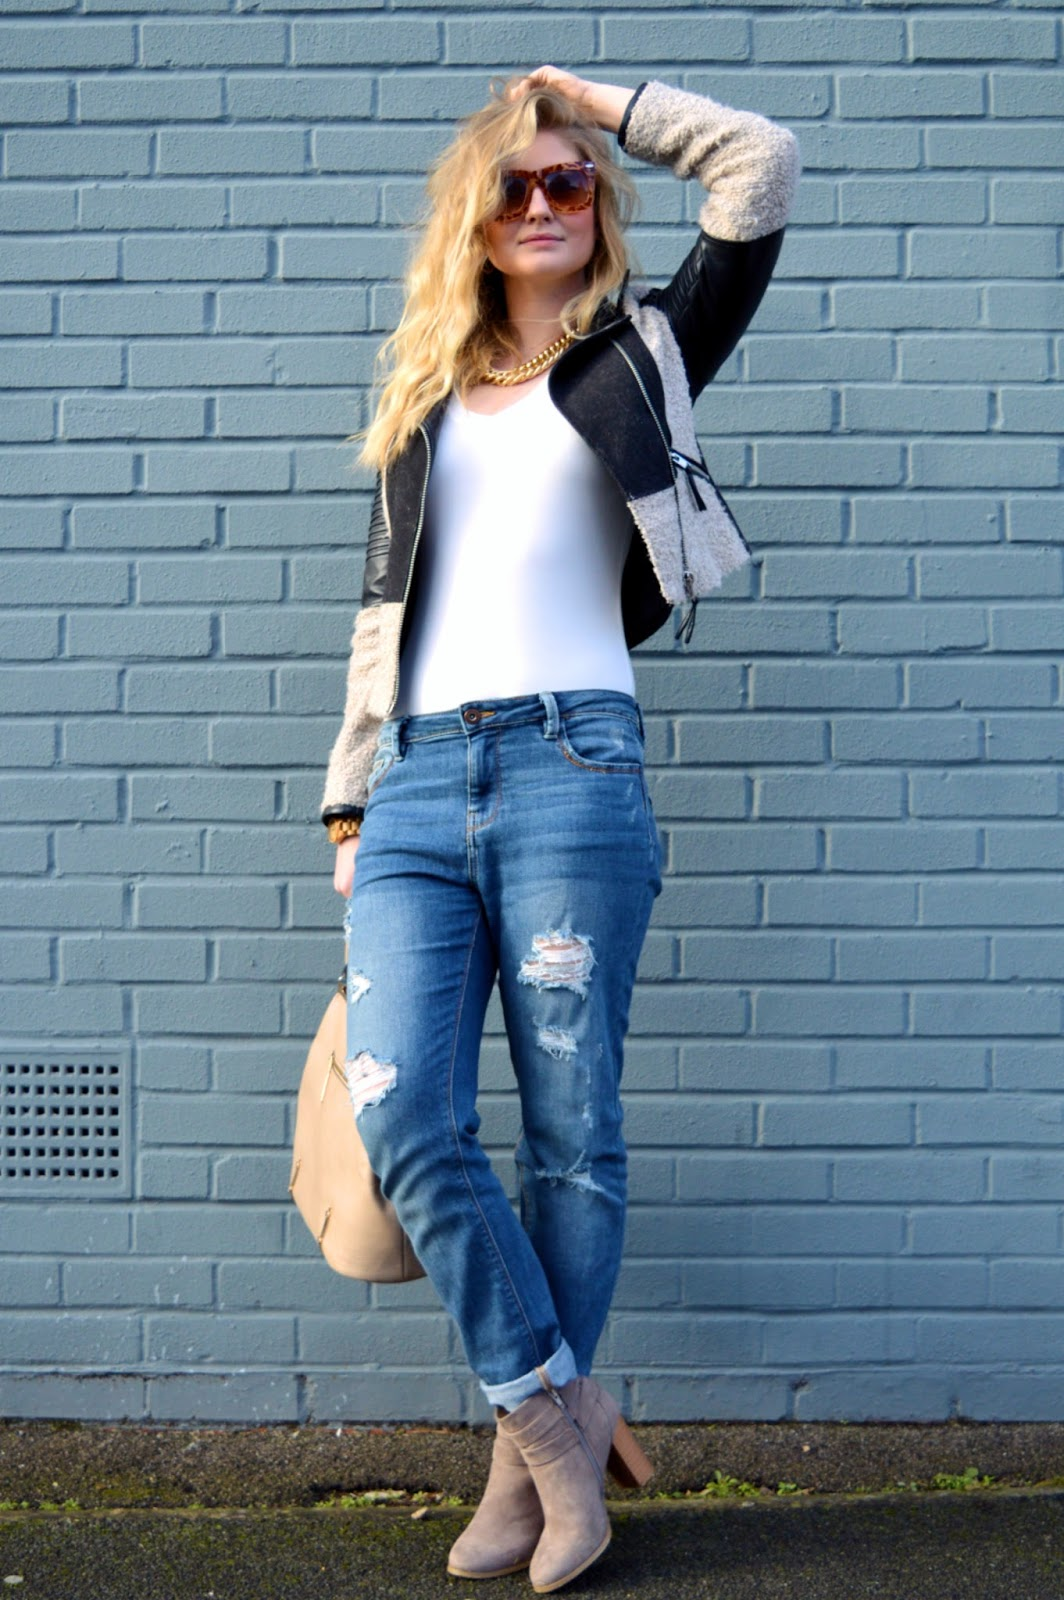 UK fashion blog, fashion bloggers, how to wear boyfriend jeans, Dalry Rose blog, personal stylist